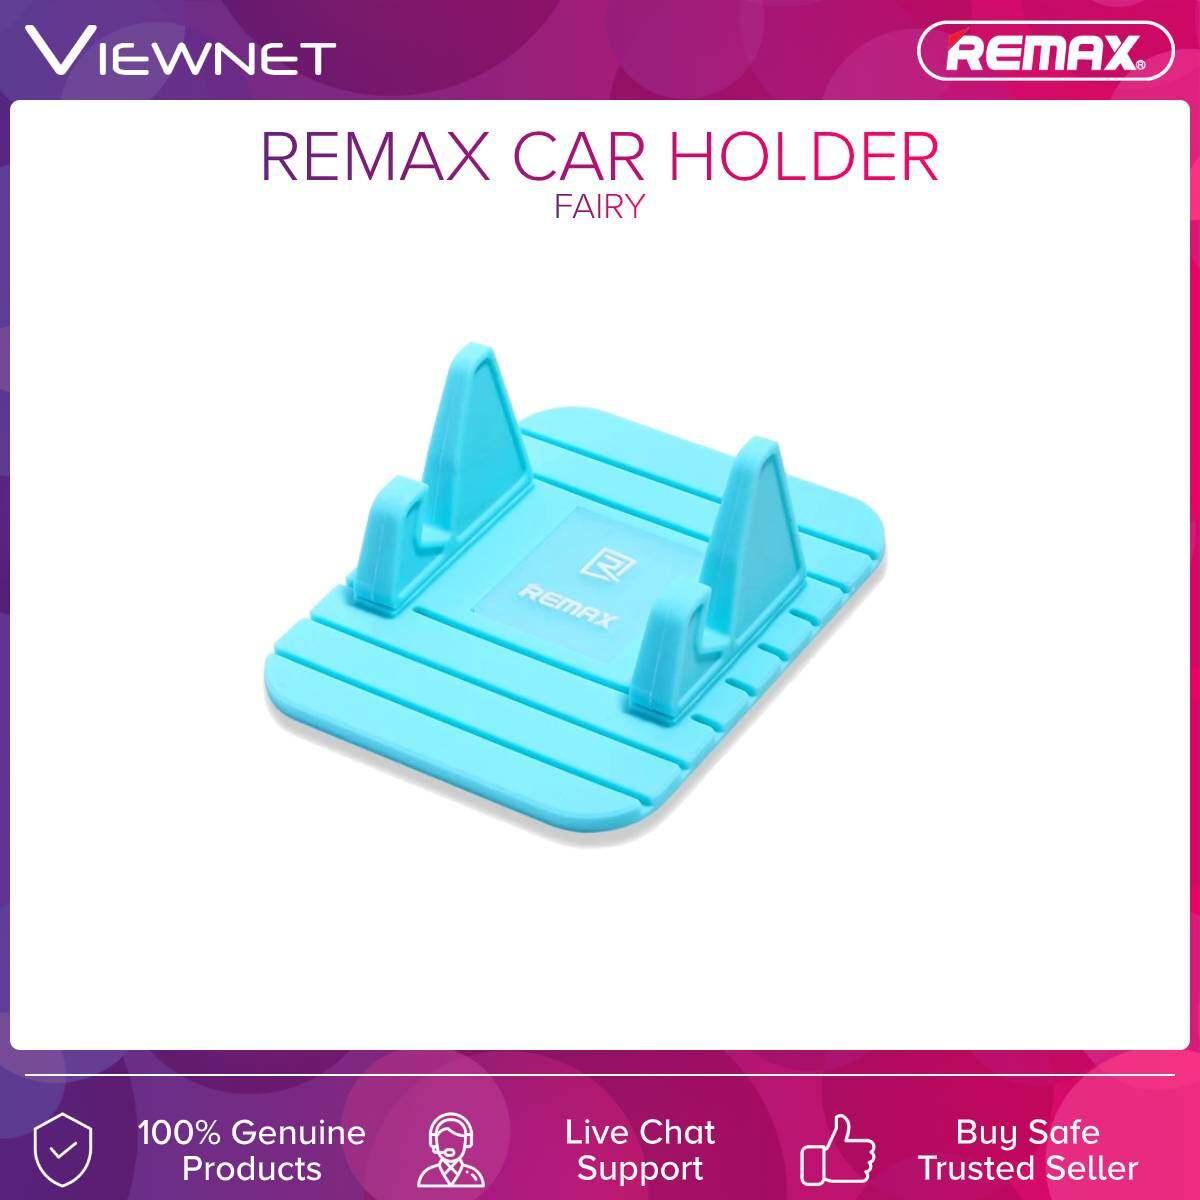 Remax Fairy Universal Car Holder